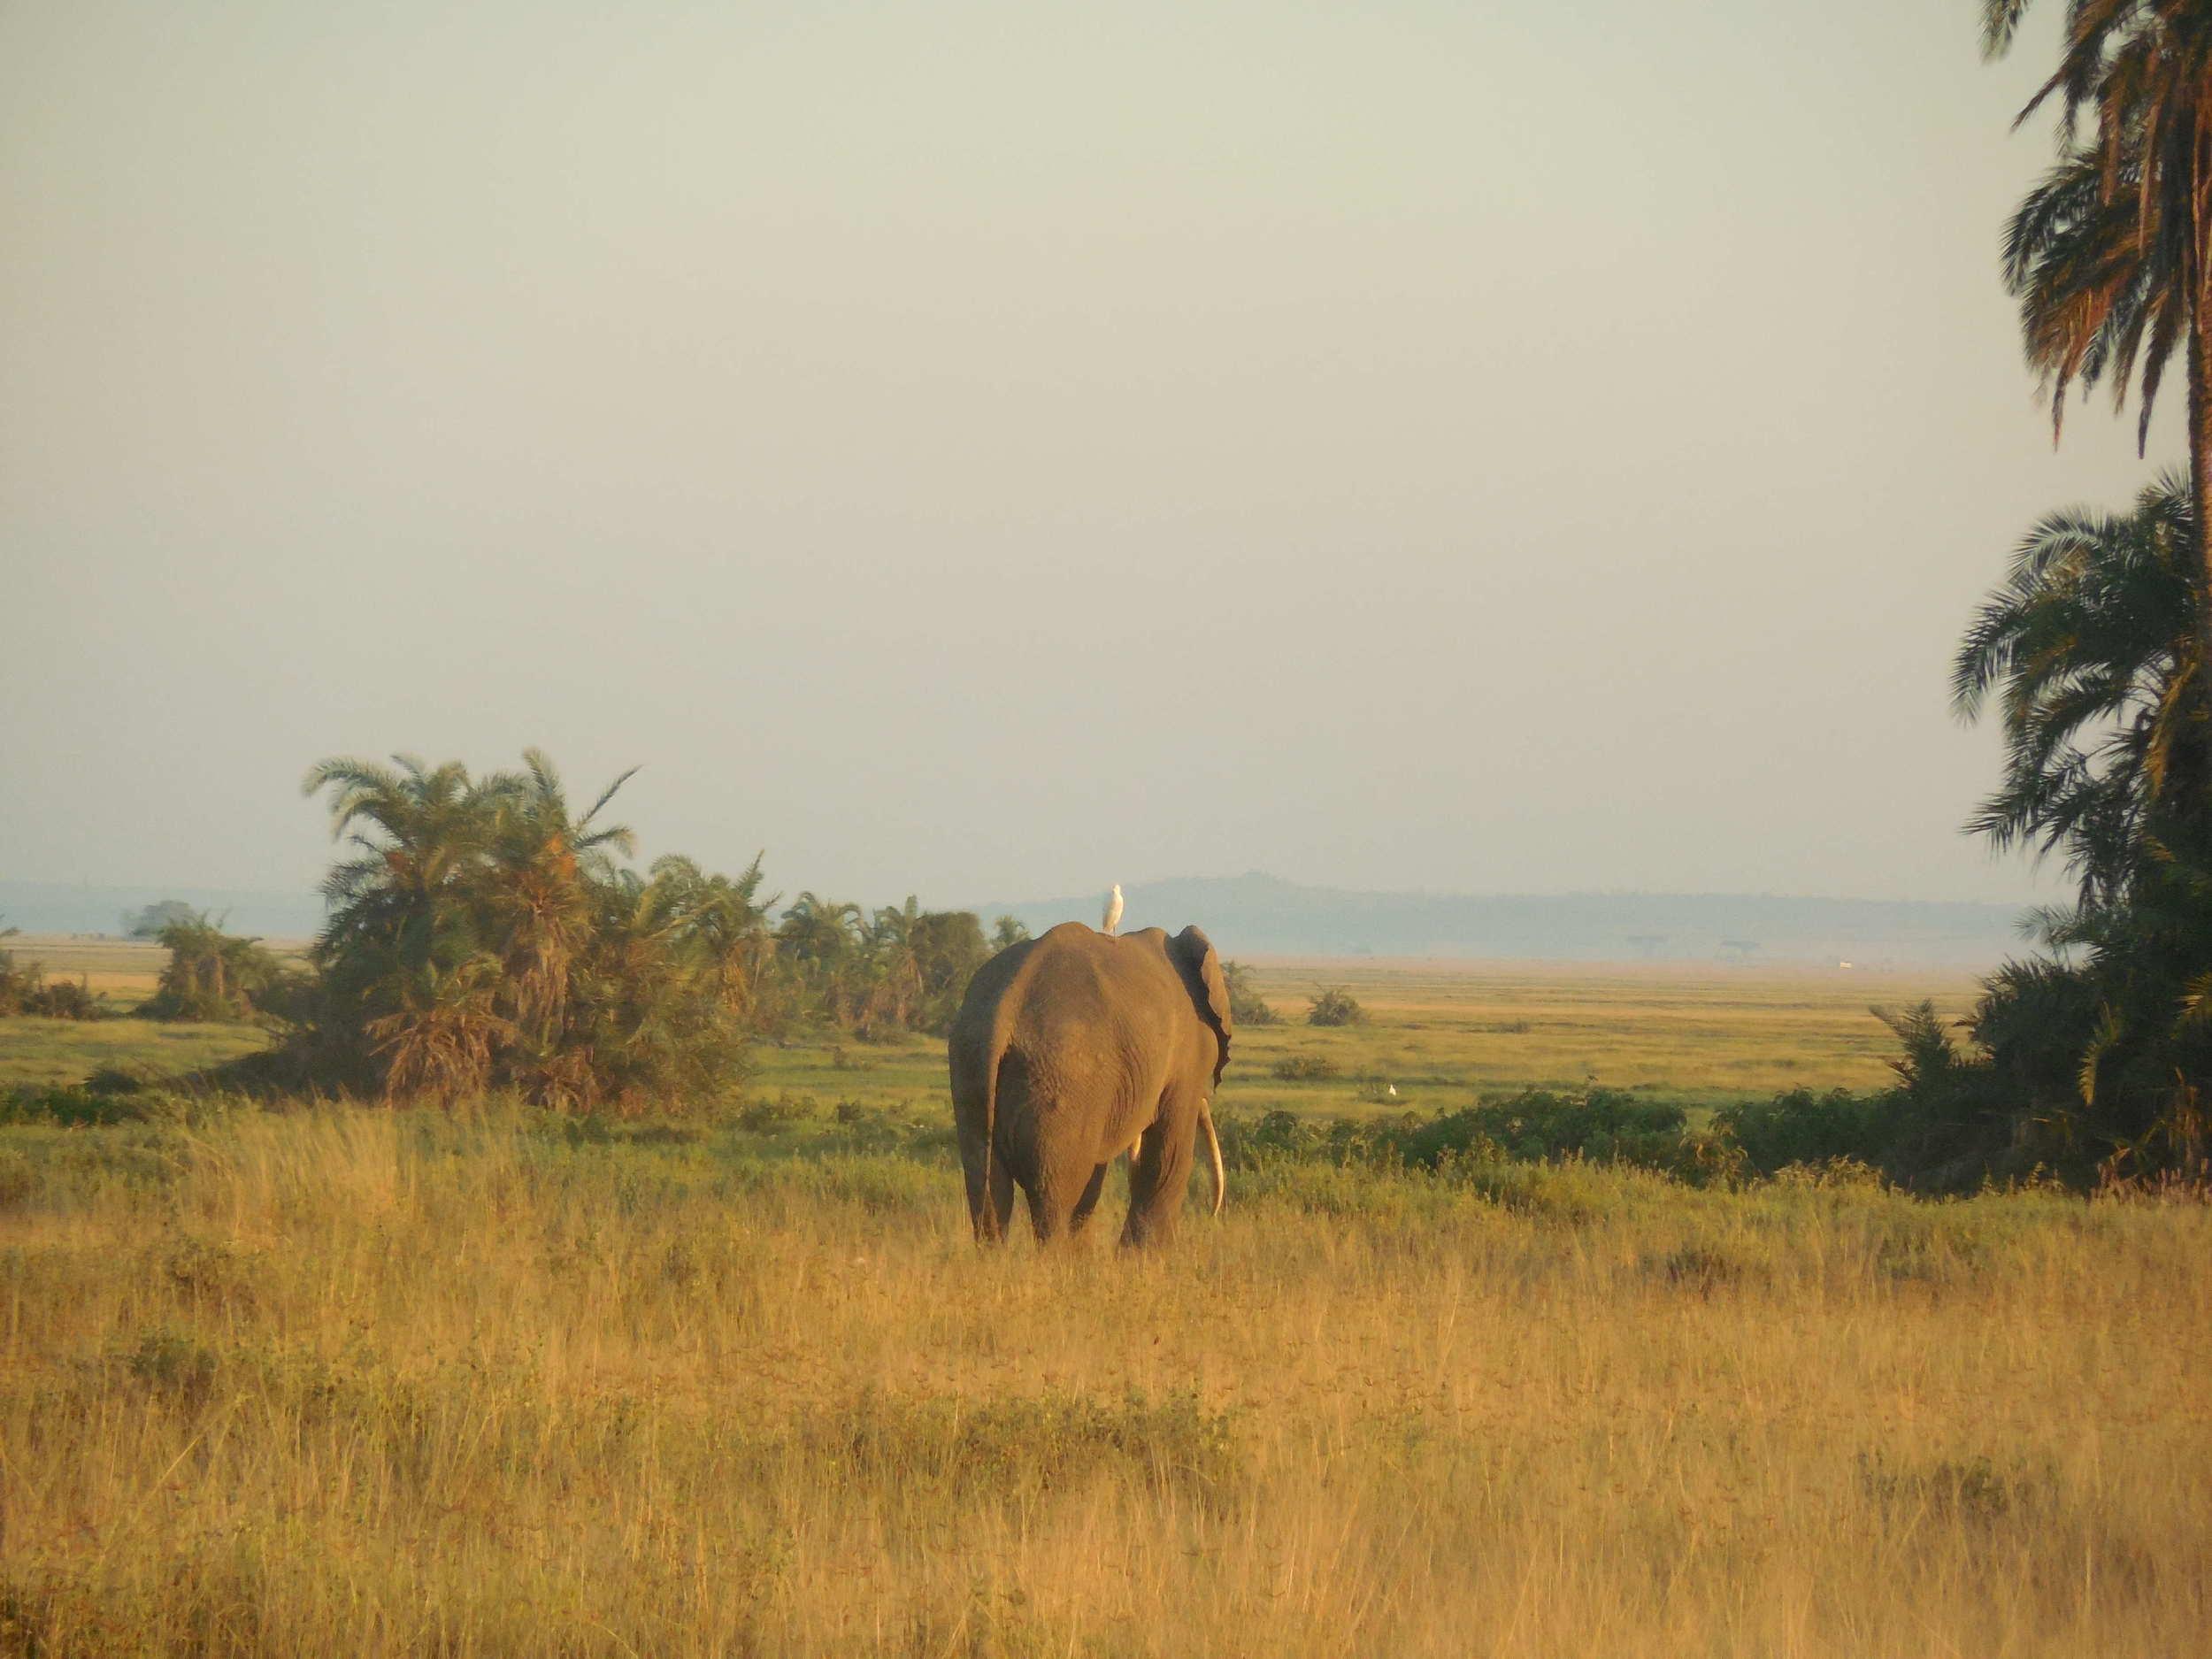 Amboseli National Park Kenya 2014 © Flyga Twiga LLC